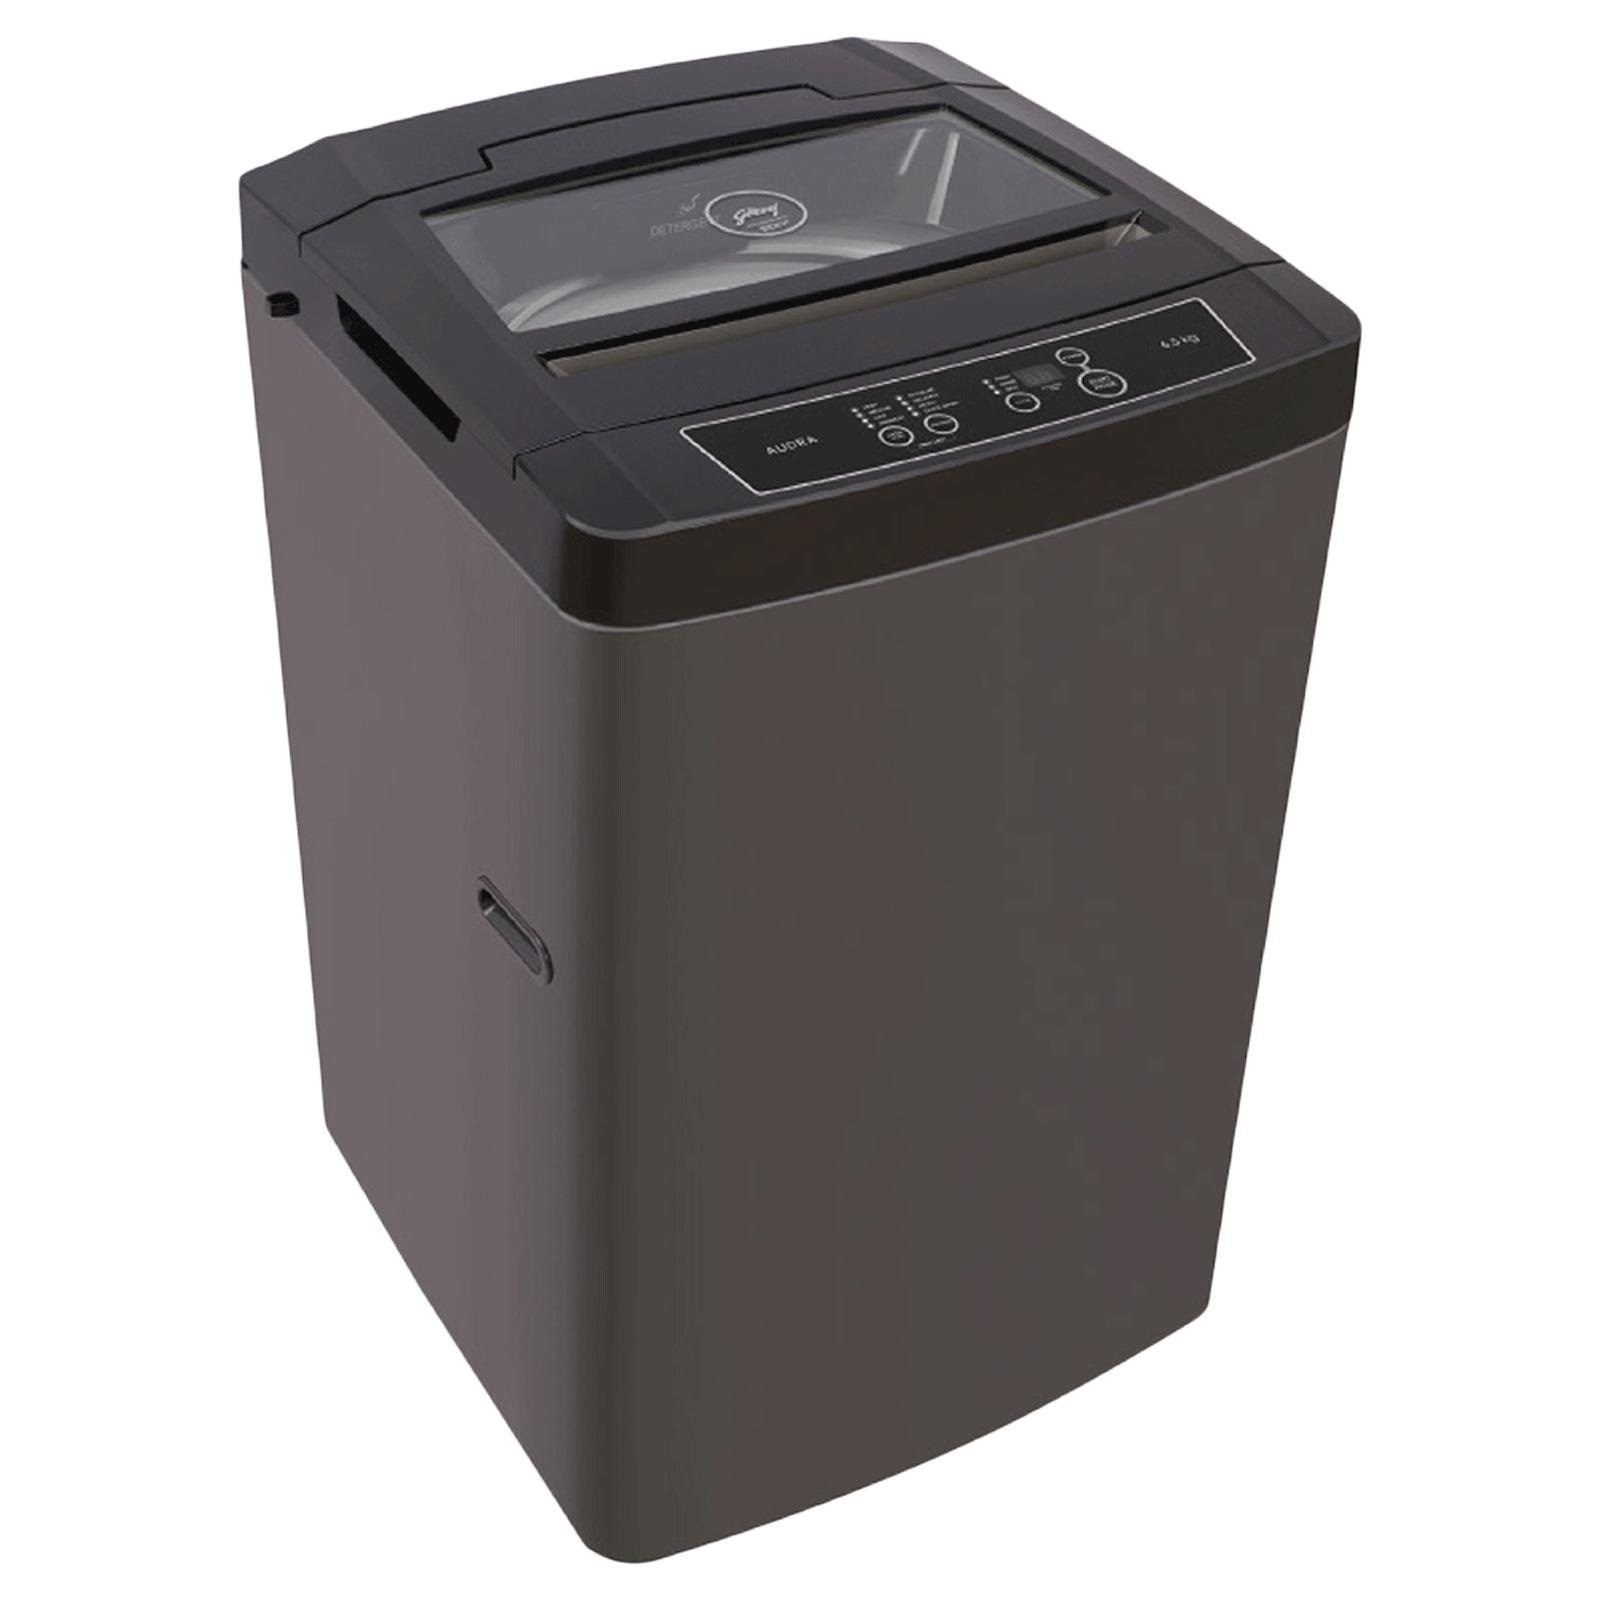 Godrej Eon Audra 6.5 kg 5 Star Fully Automatic Top Load Washing Machine (Auto Balance System, WTA EON AUDRA 650 PDNMP, Graphite Grey)_1